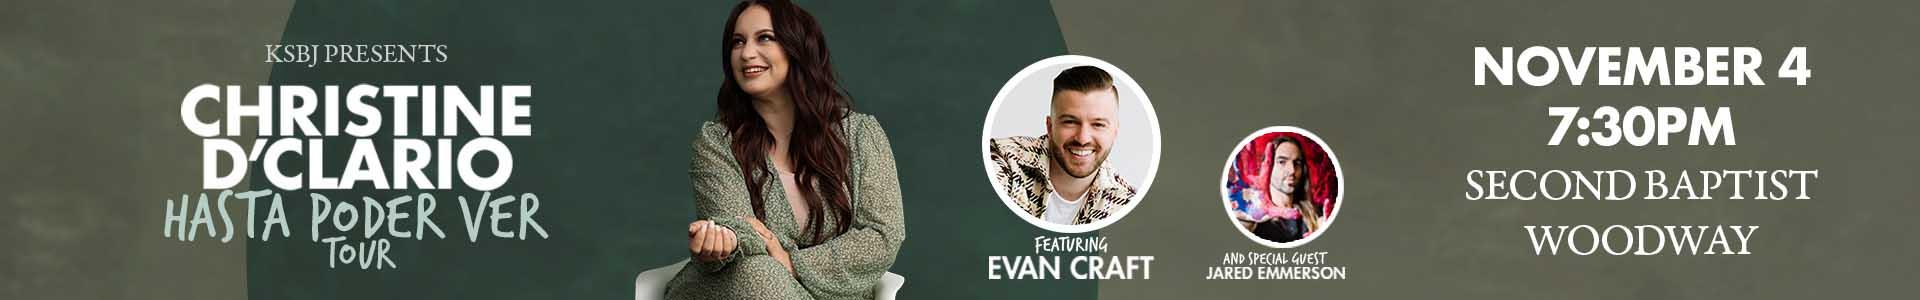 KSBJ Presents Hasta Poder Ver with Christine D'Clario and Evan Craft